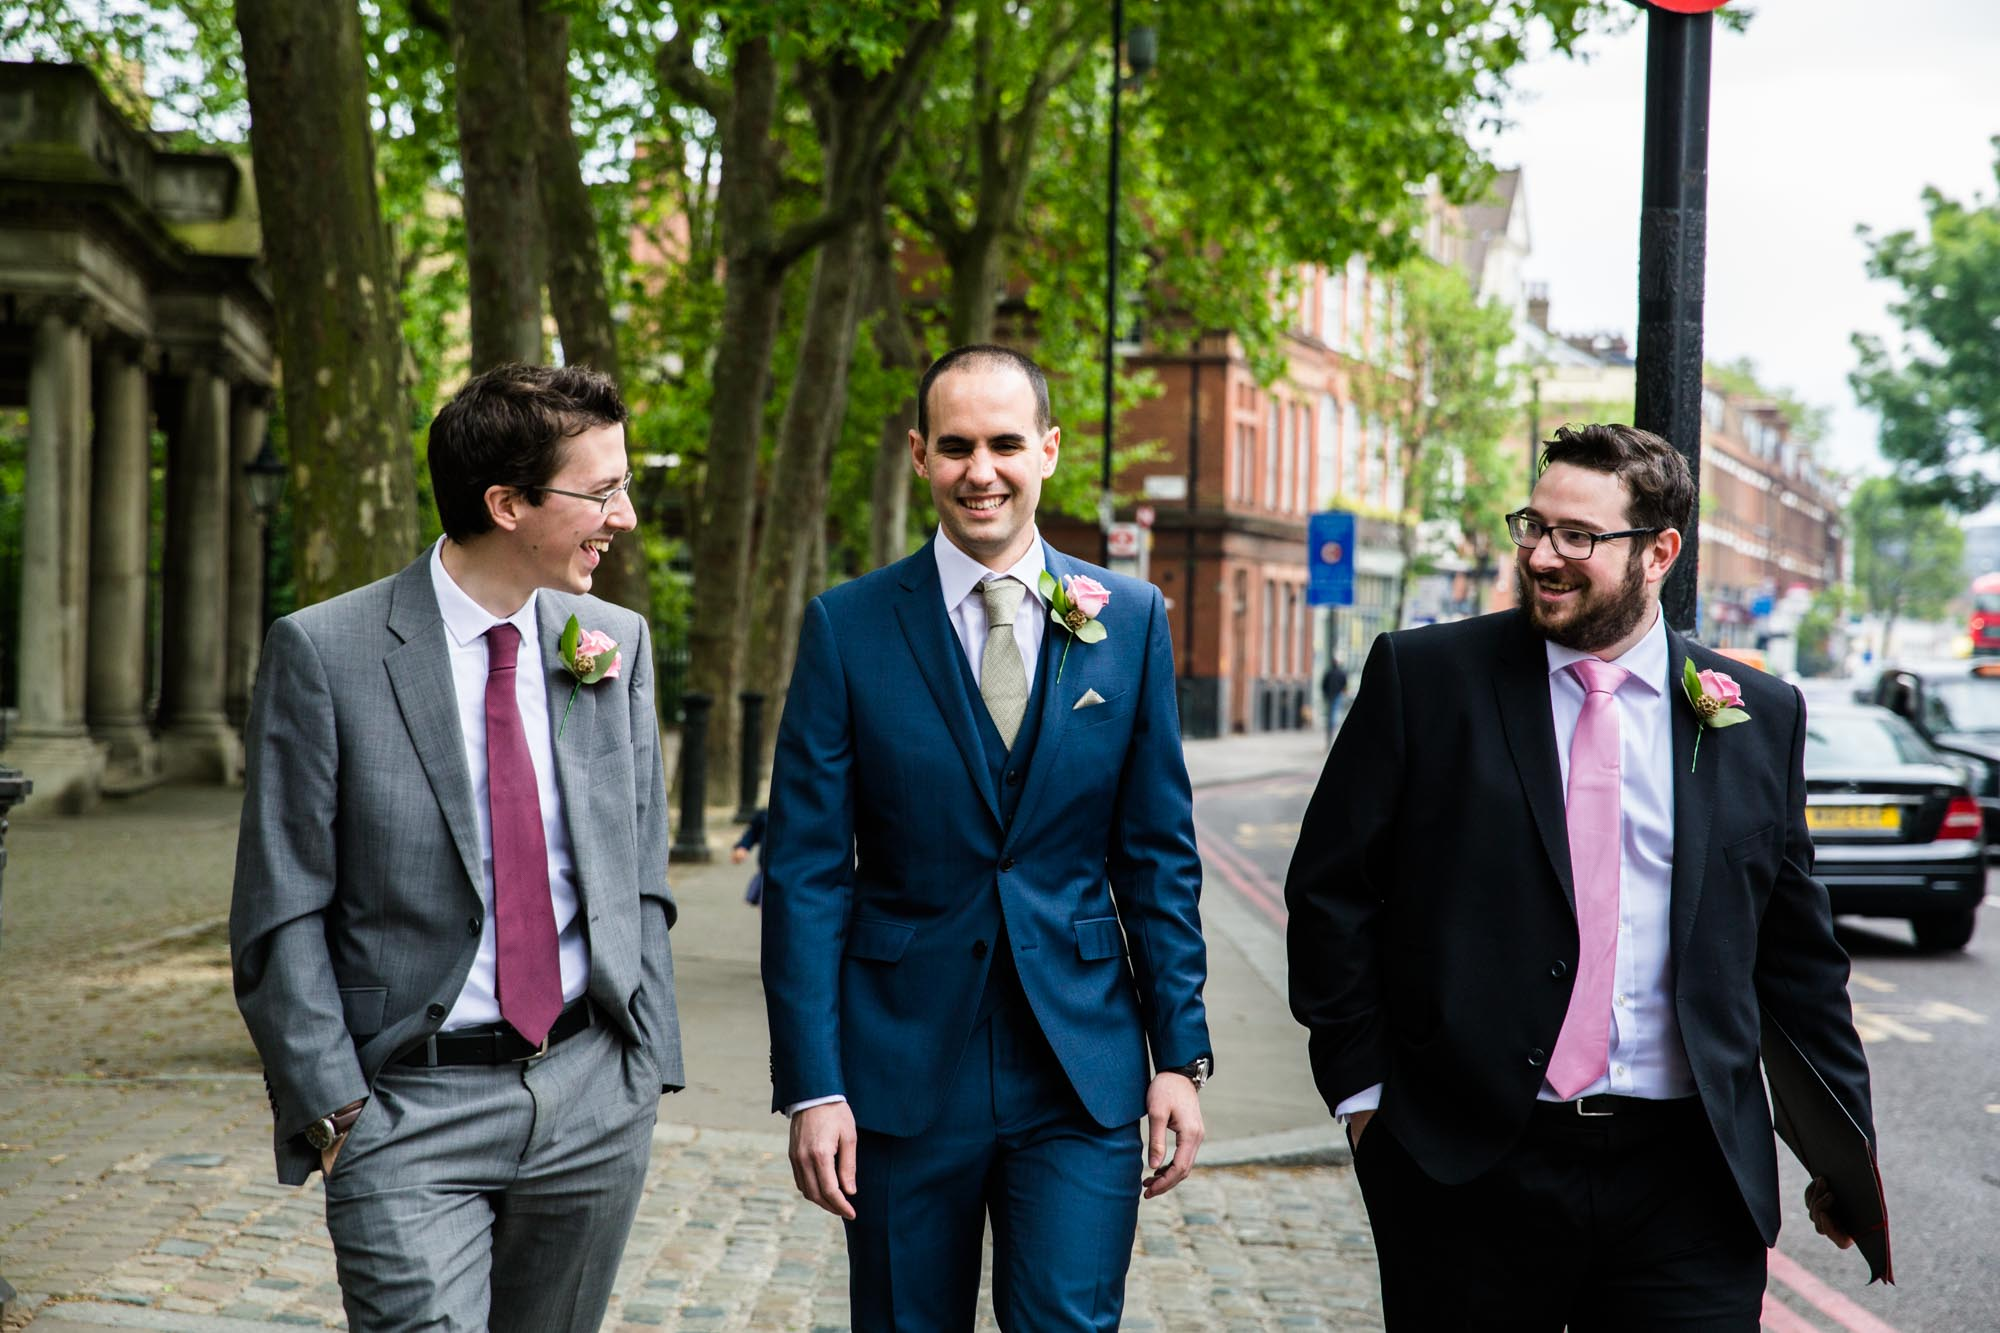 Malmaison London Natural Wedding Photographs